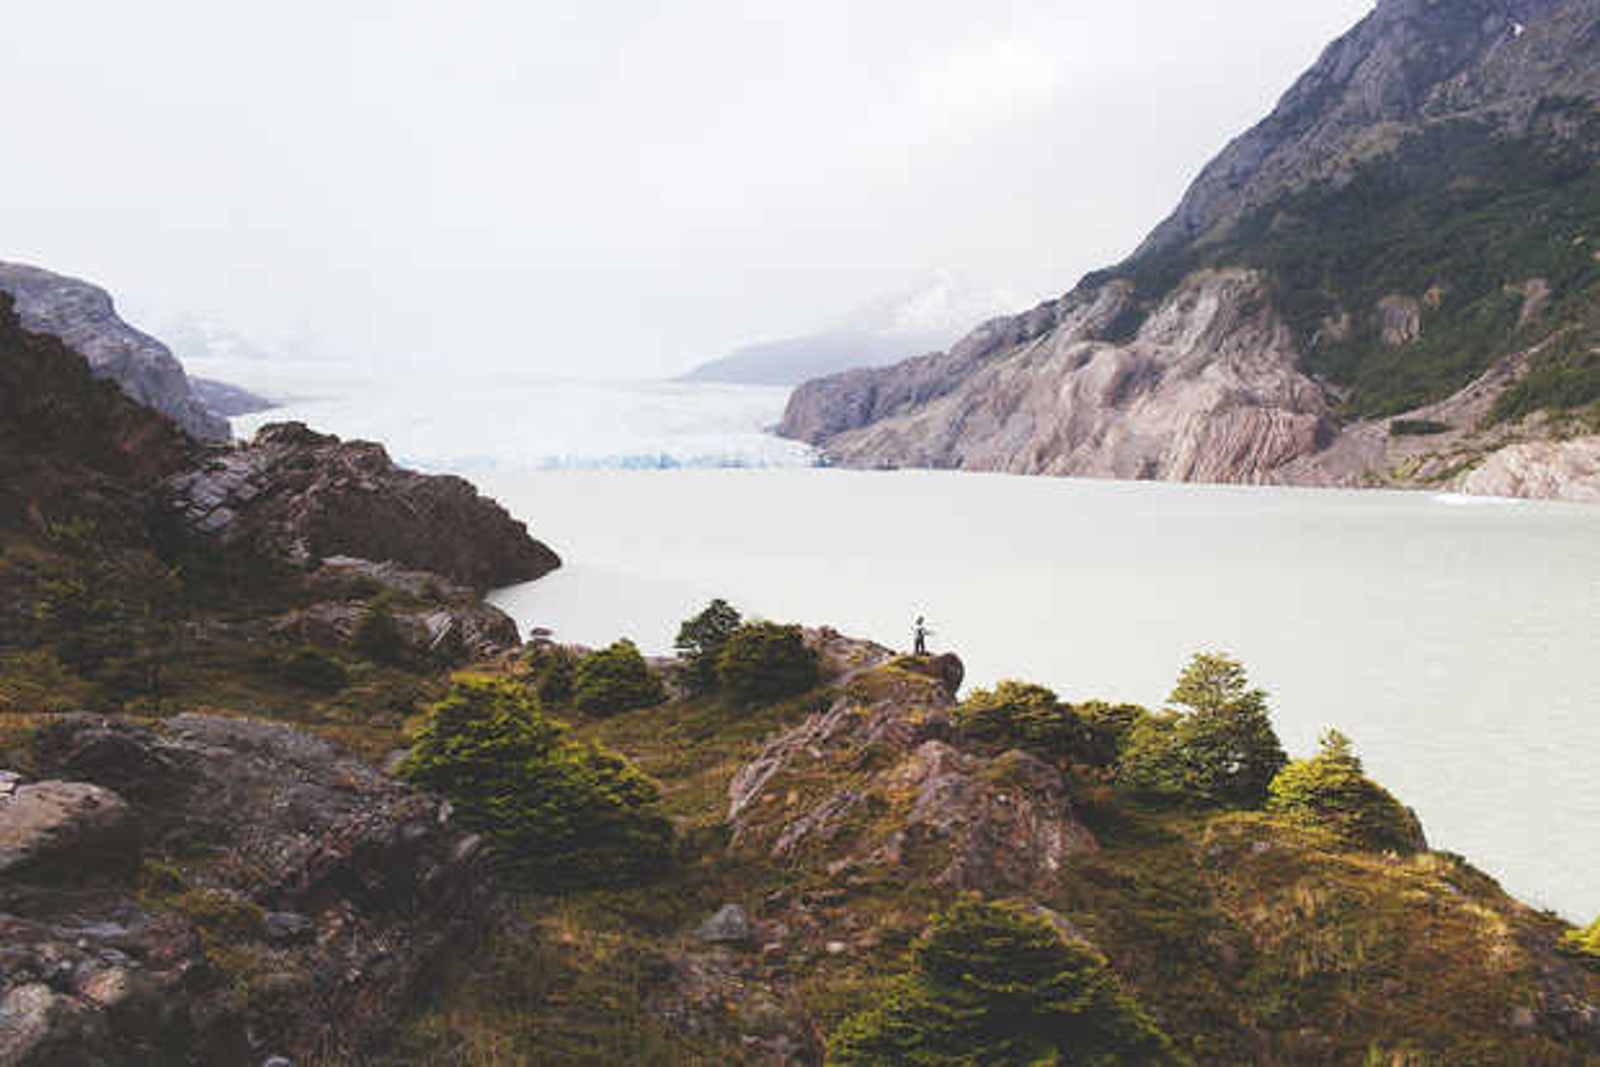 Patagonia - Alex Strohl